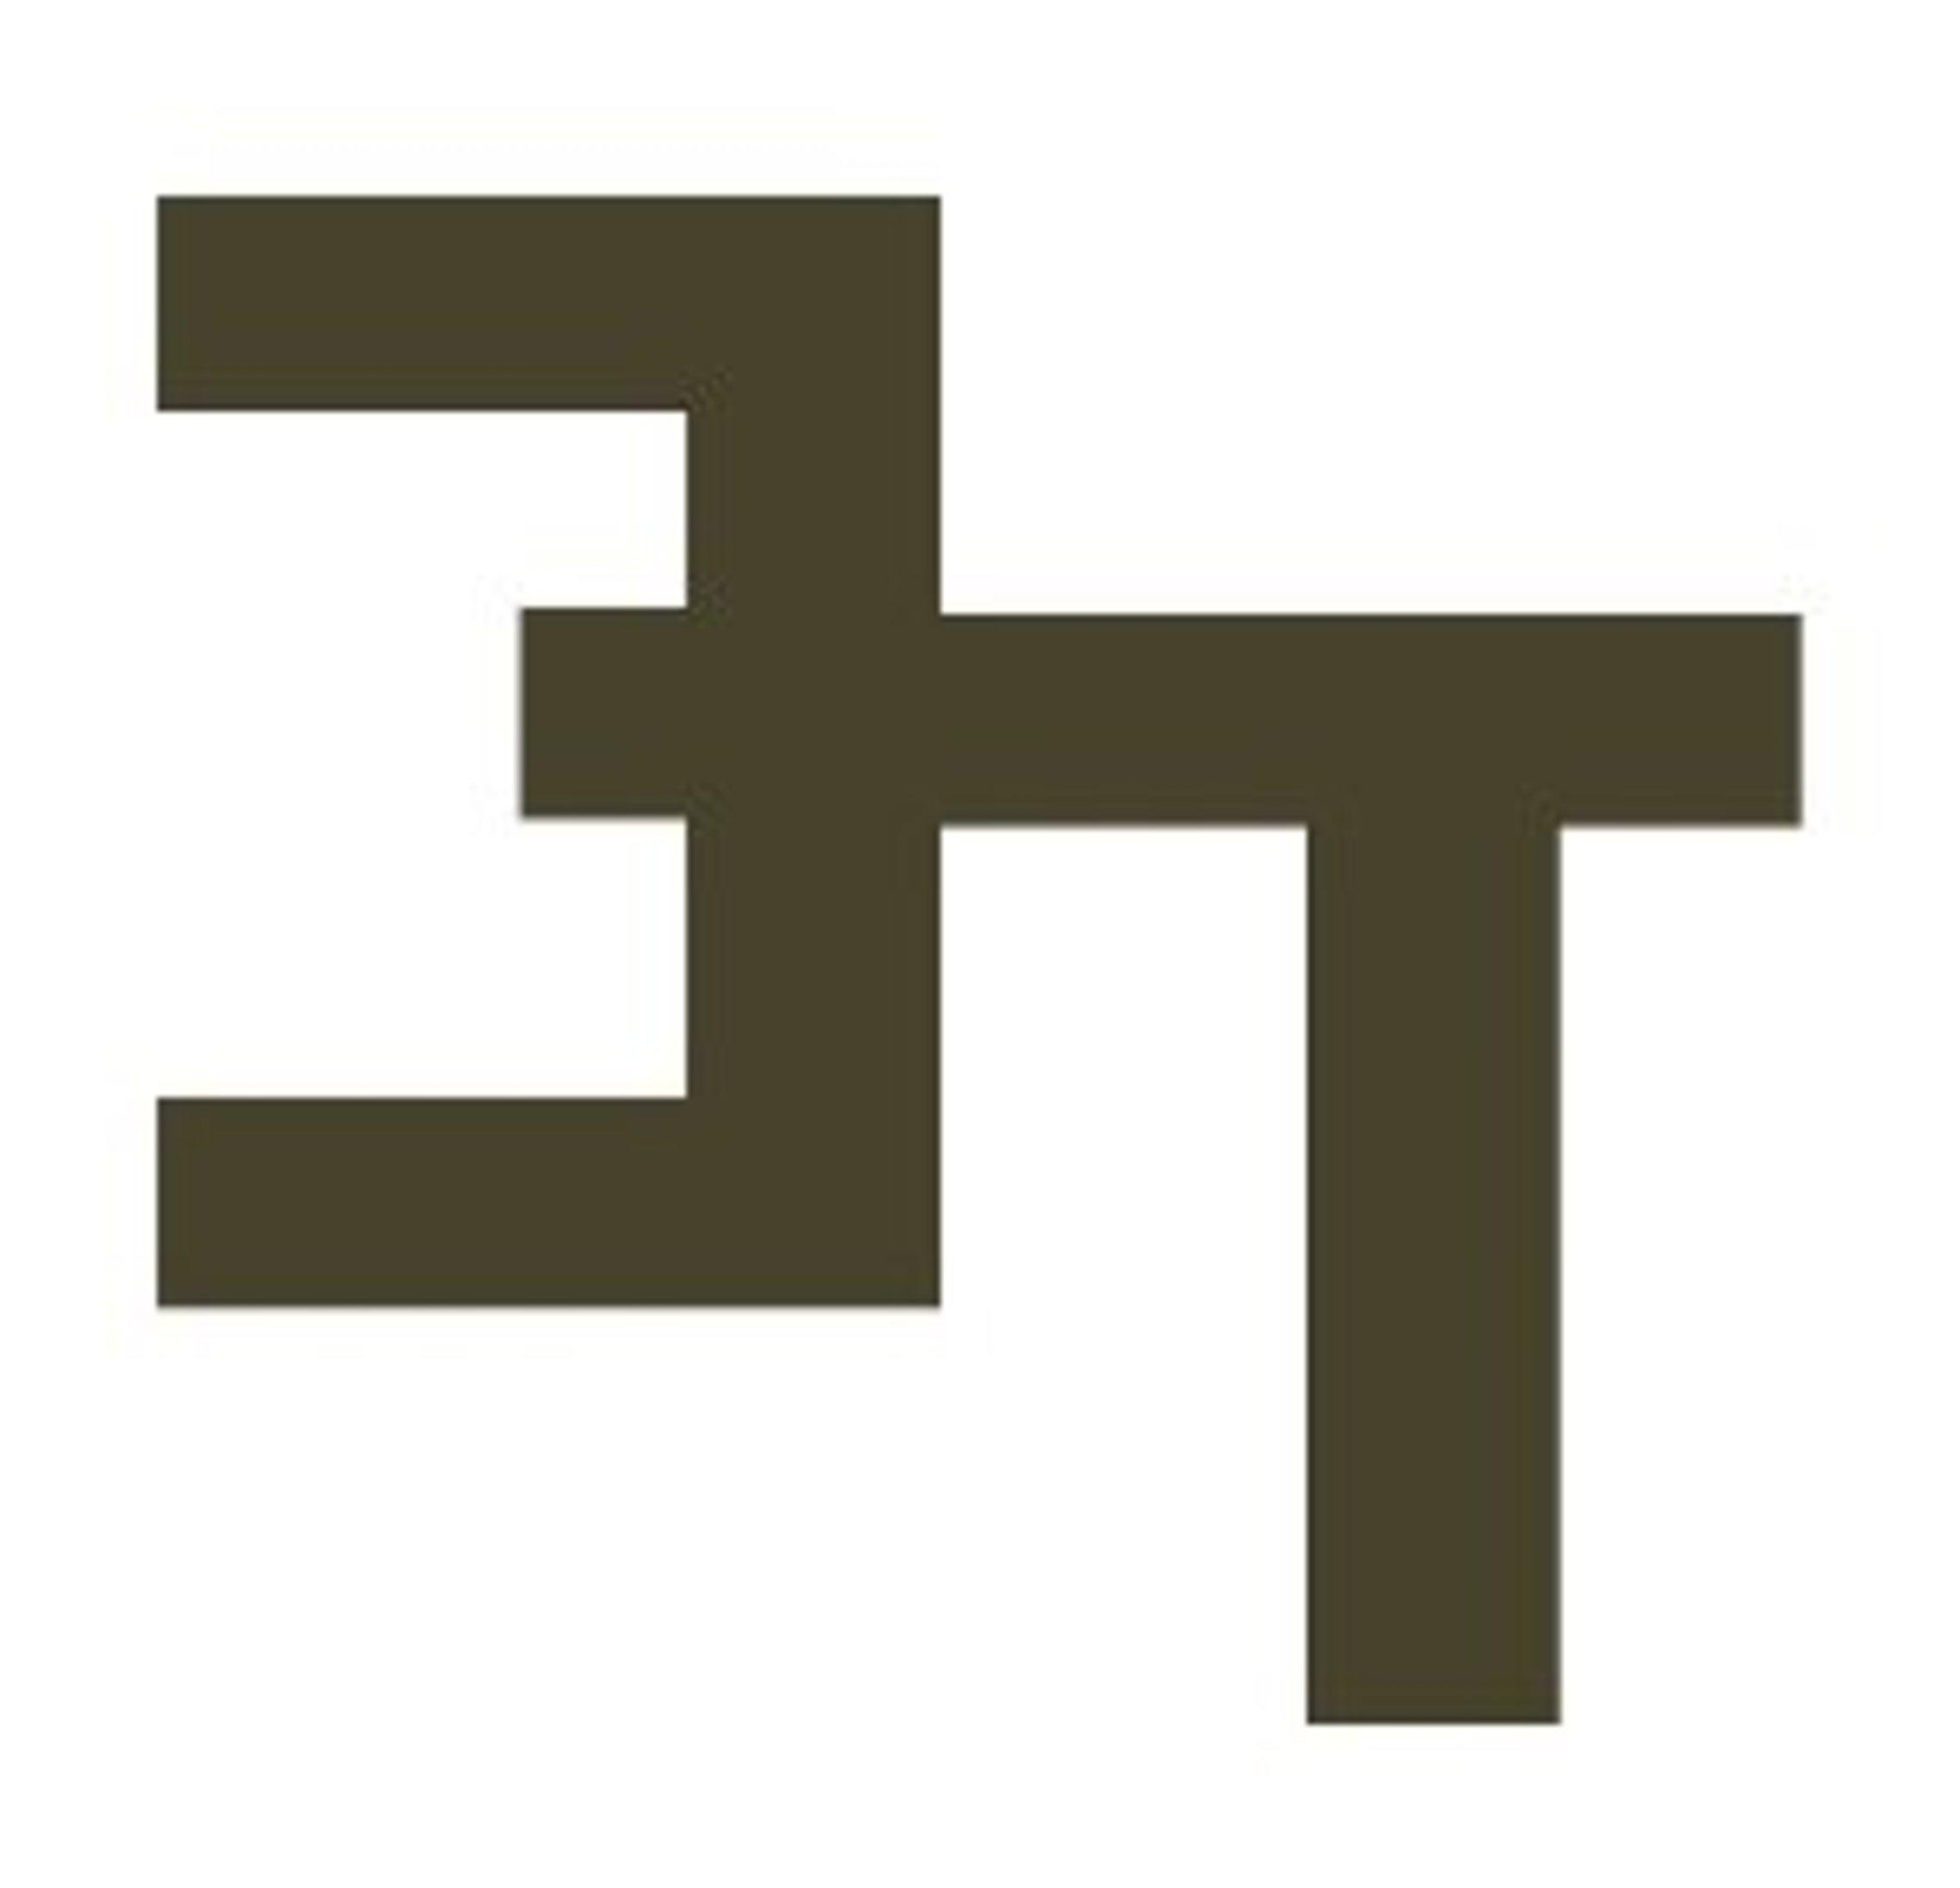 ebury trading- company logo